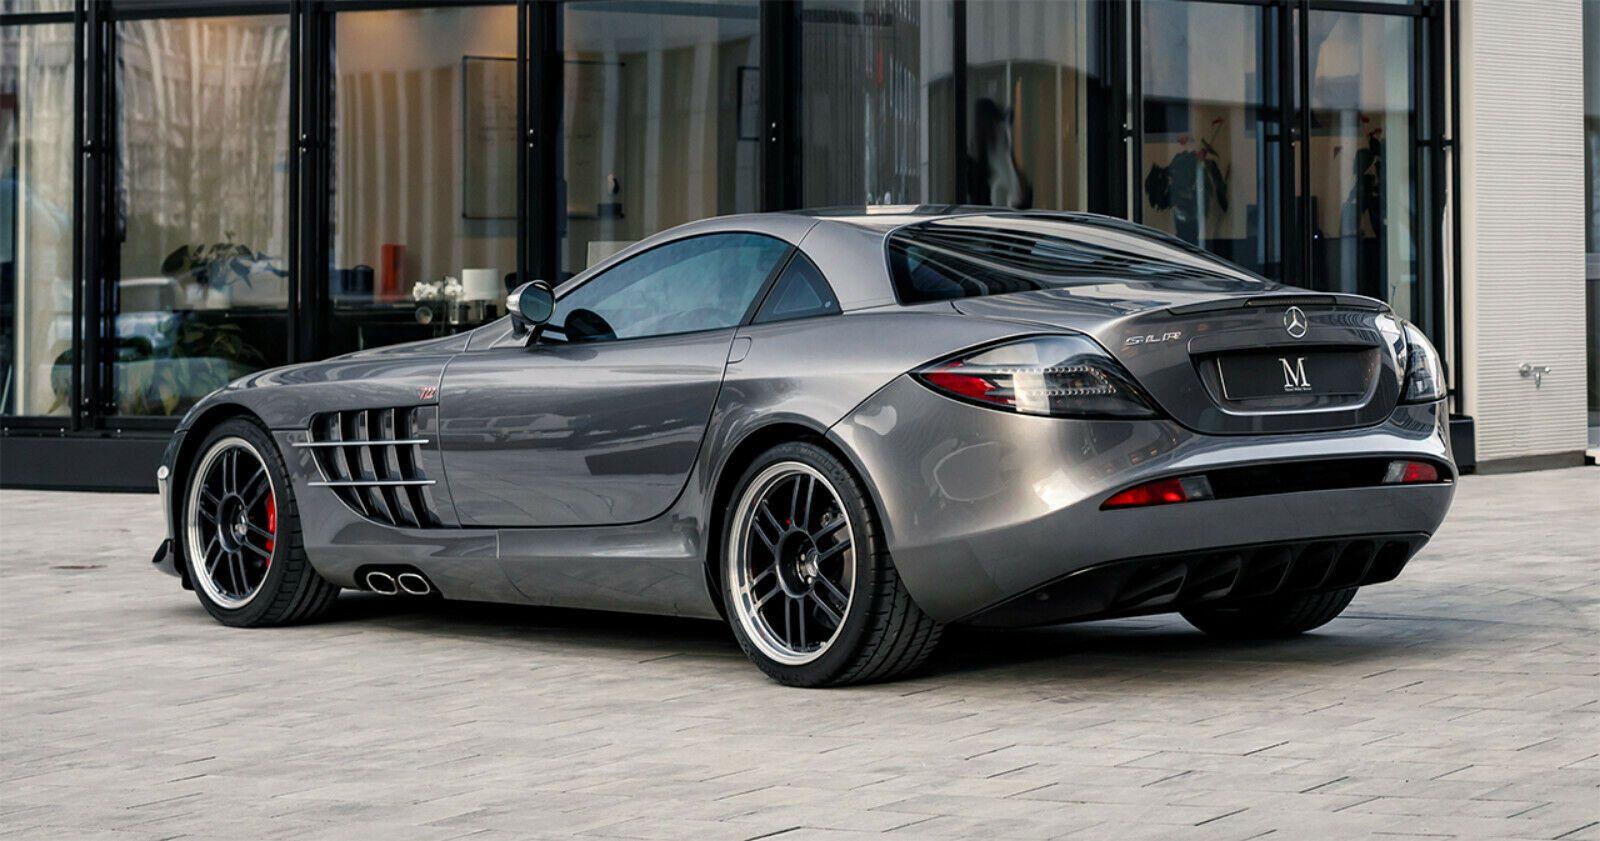 Mercedes Benz Mercedes Benz Slr Mclaren 722 Coupe Marcel Muller